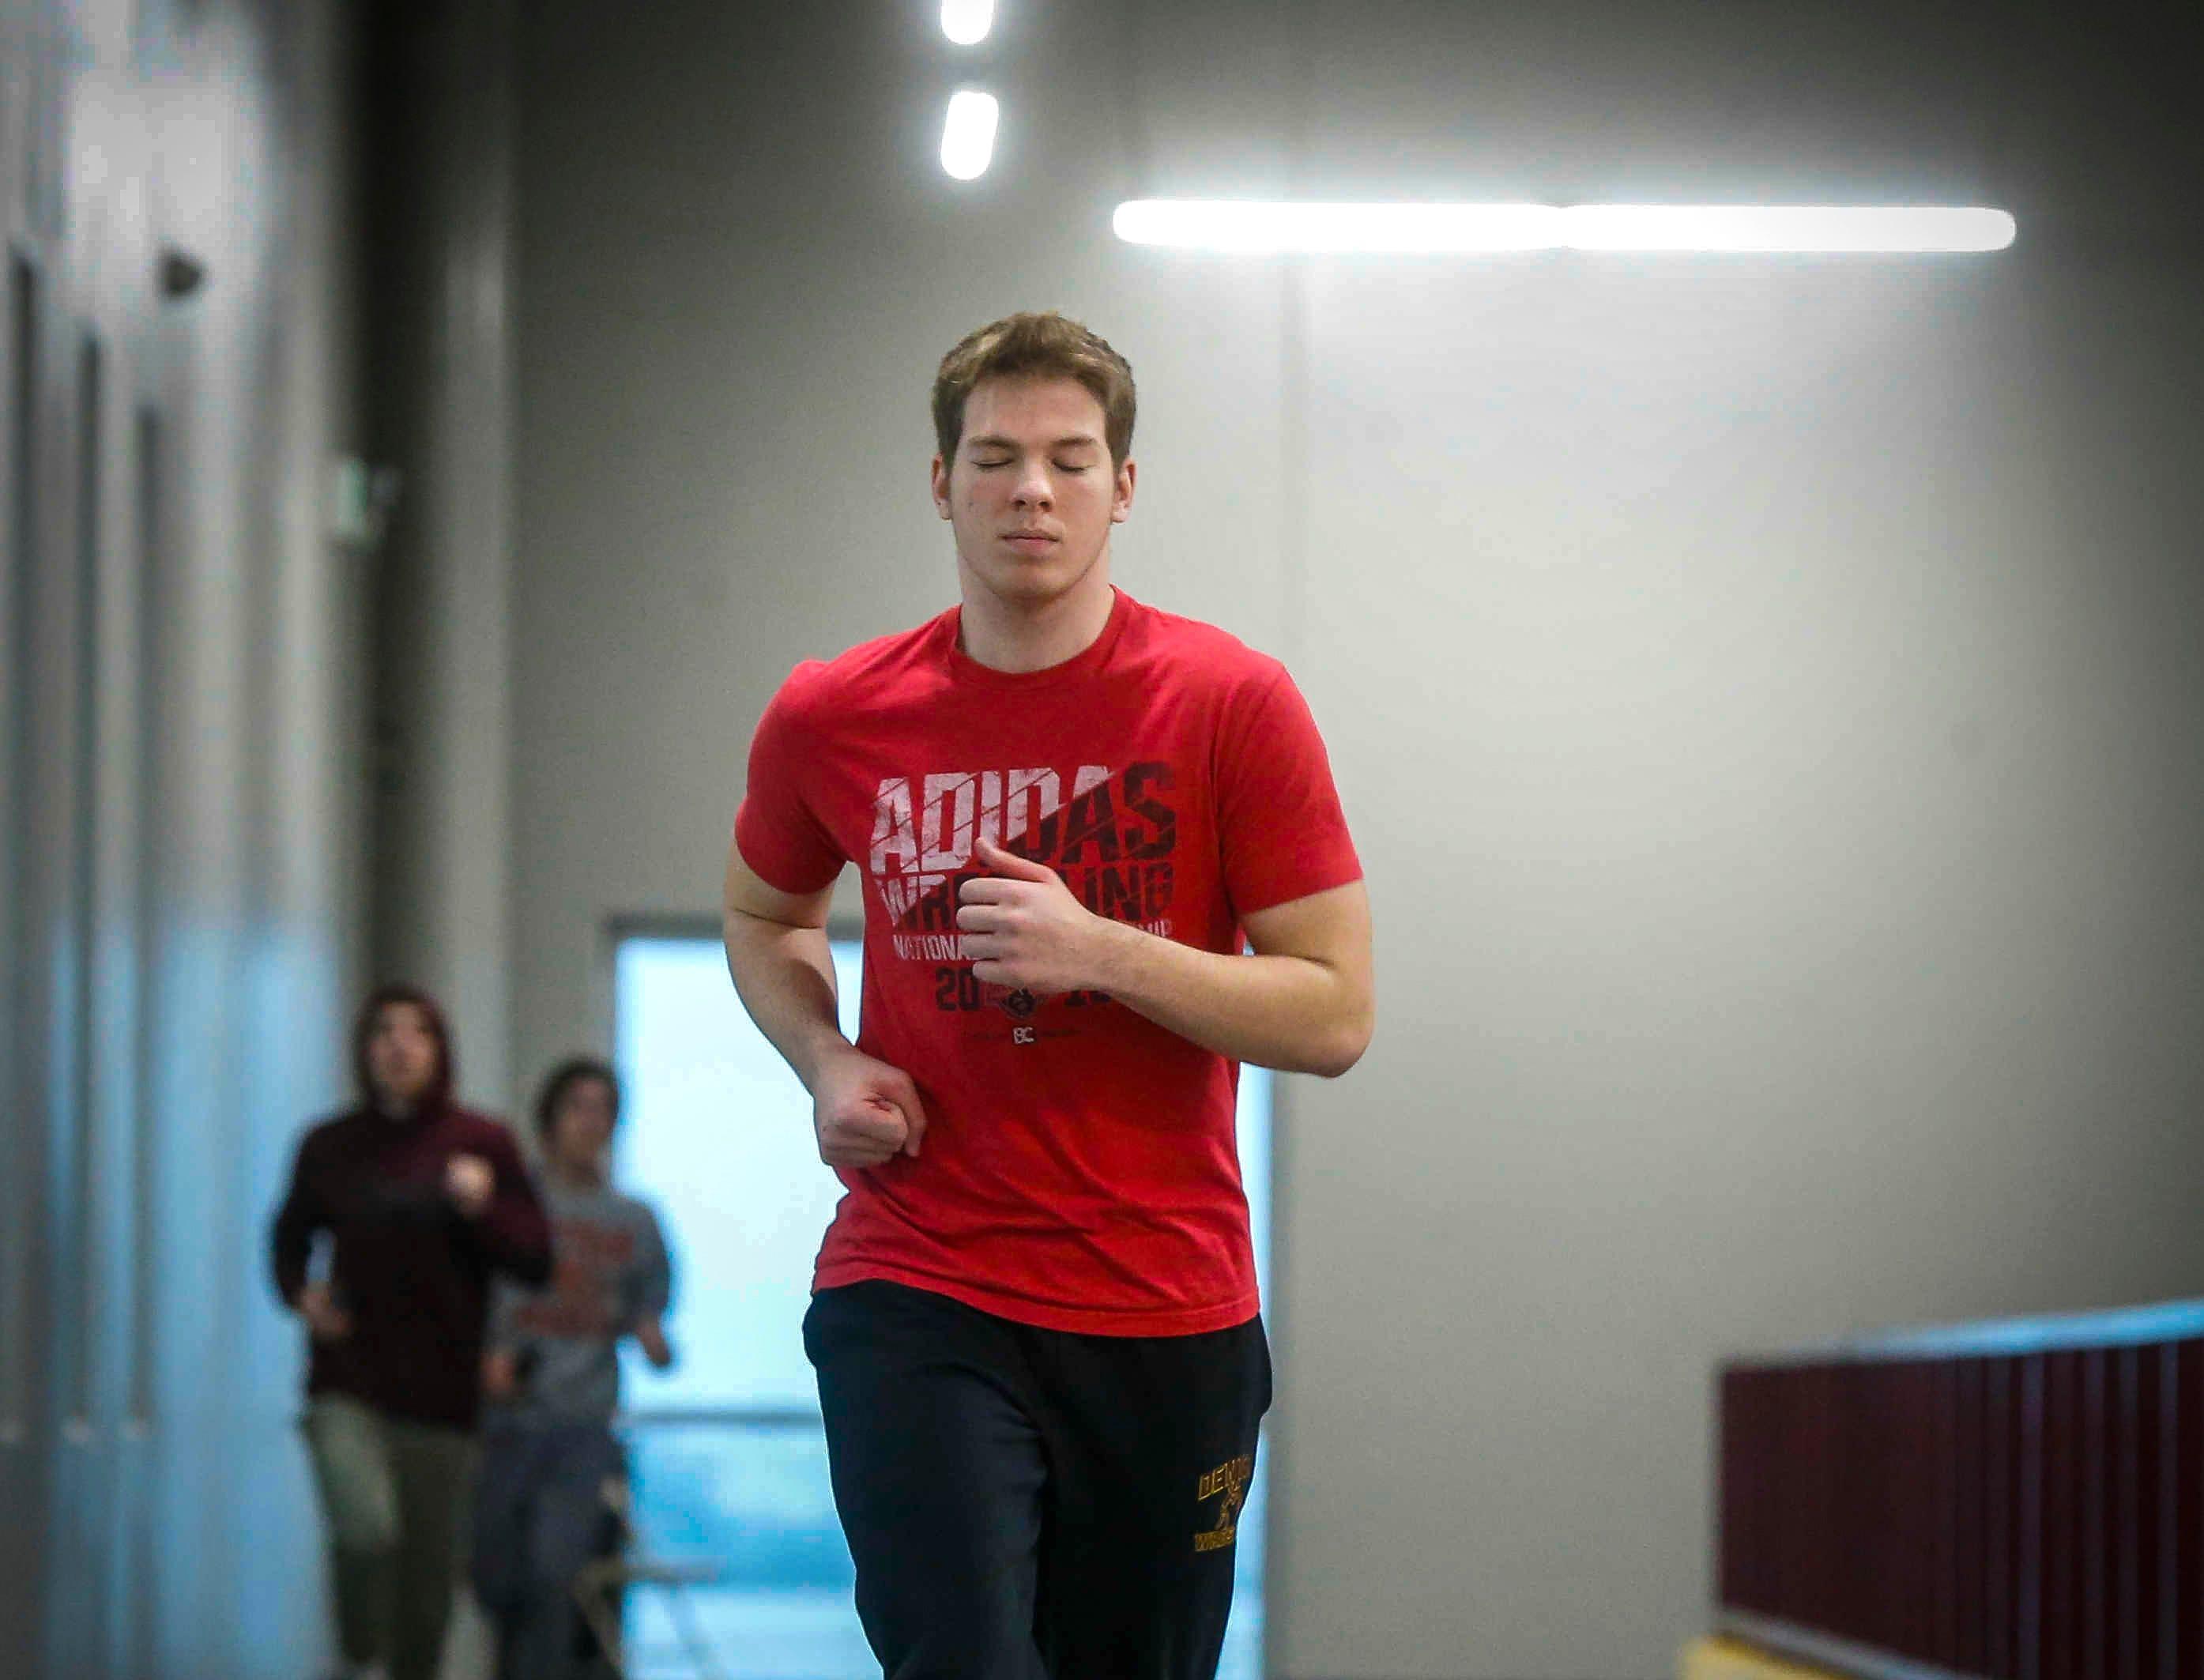 Denver sophomore wrestler Cam Krueger runs laps prior to wrestling practice at the Denver High School in Denver on Tuesday, Jan. 15, 2019. Krueger was born legally blind.